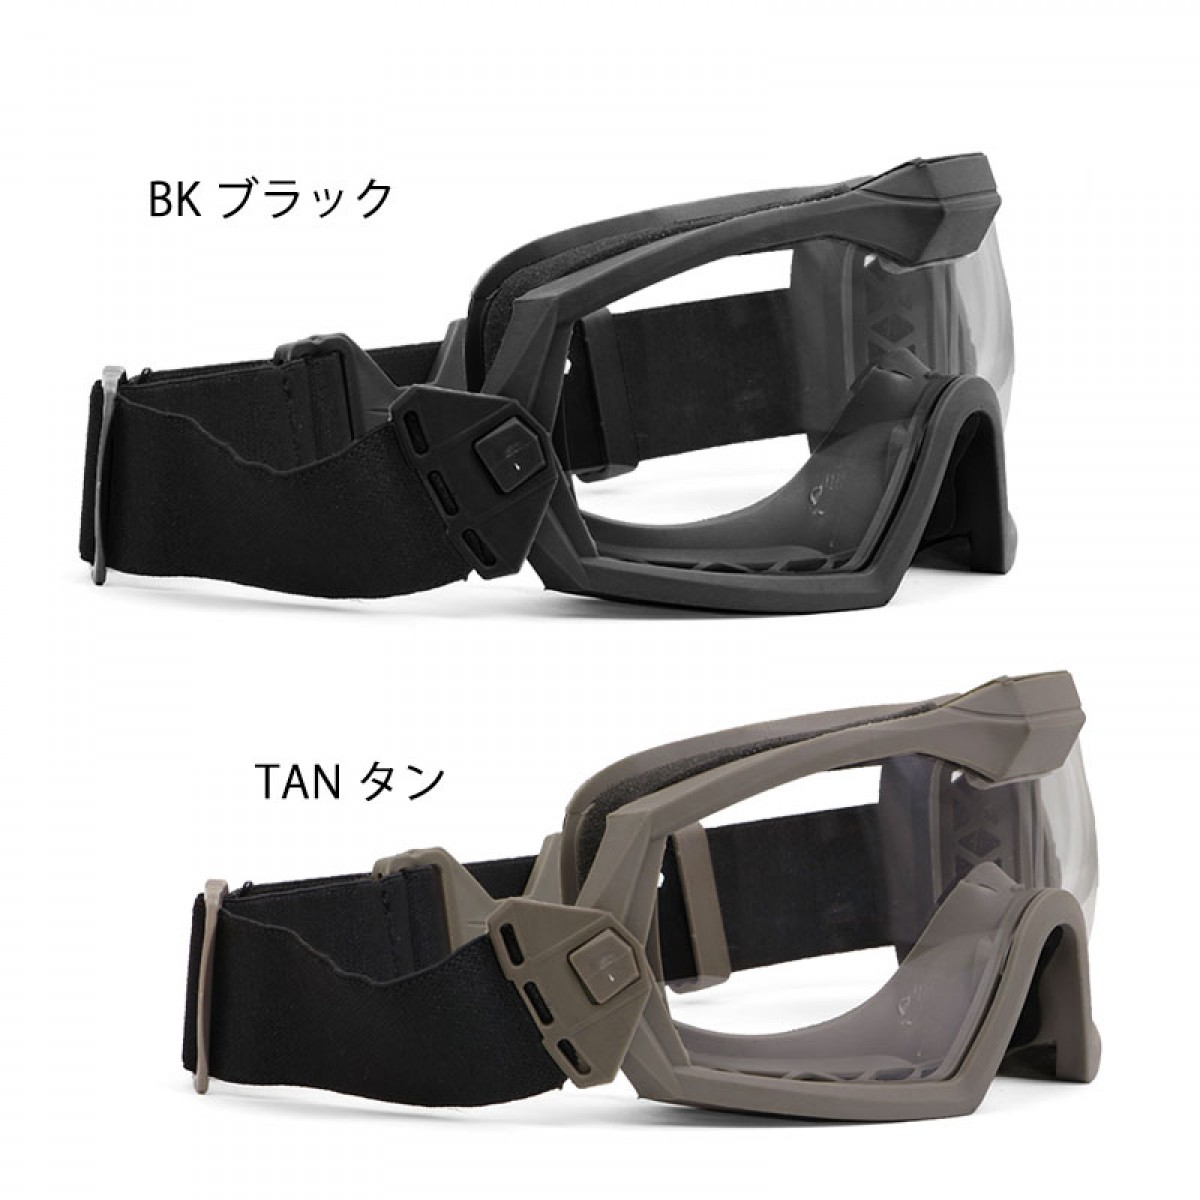 SHENKEL W.F.B タクティカル ゴーグル ターボファン BK/TAN ワイドフレームバリスティック ブラック/タン